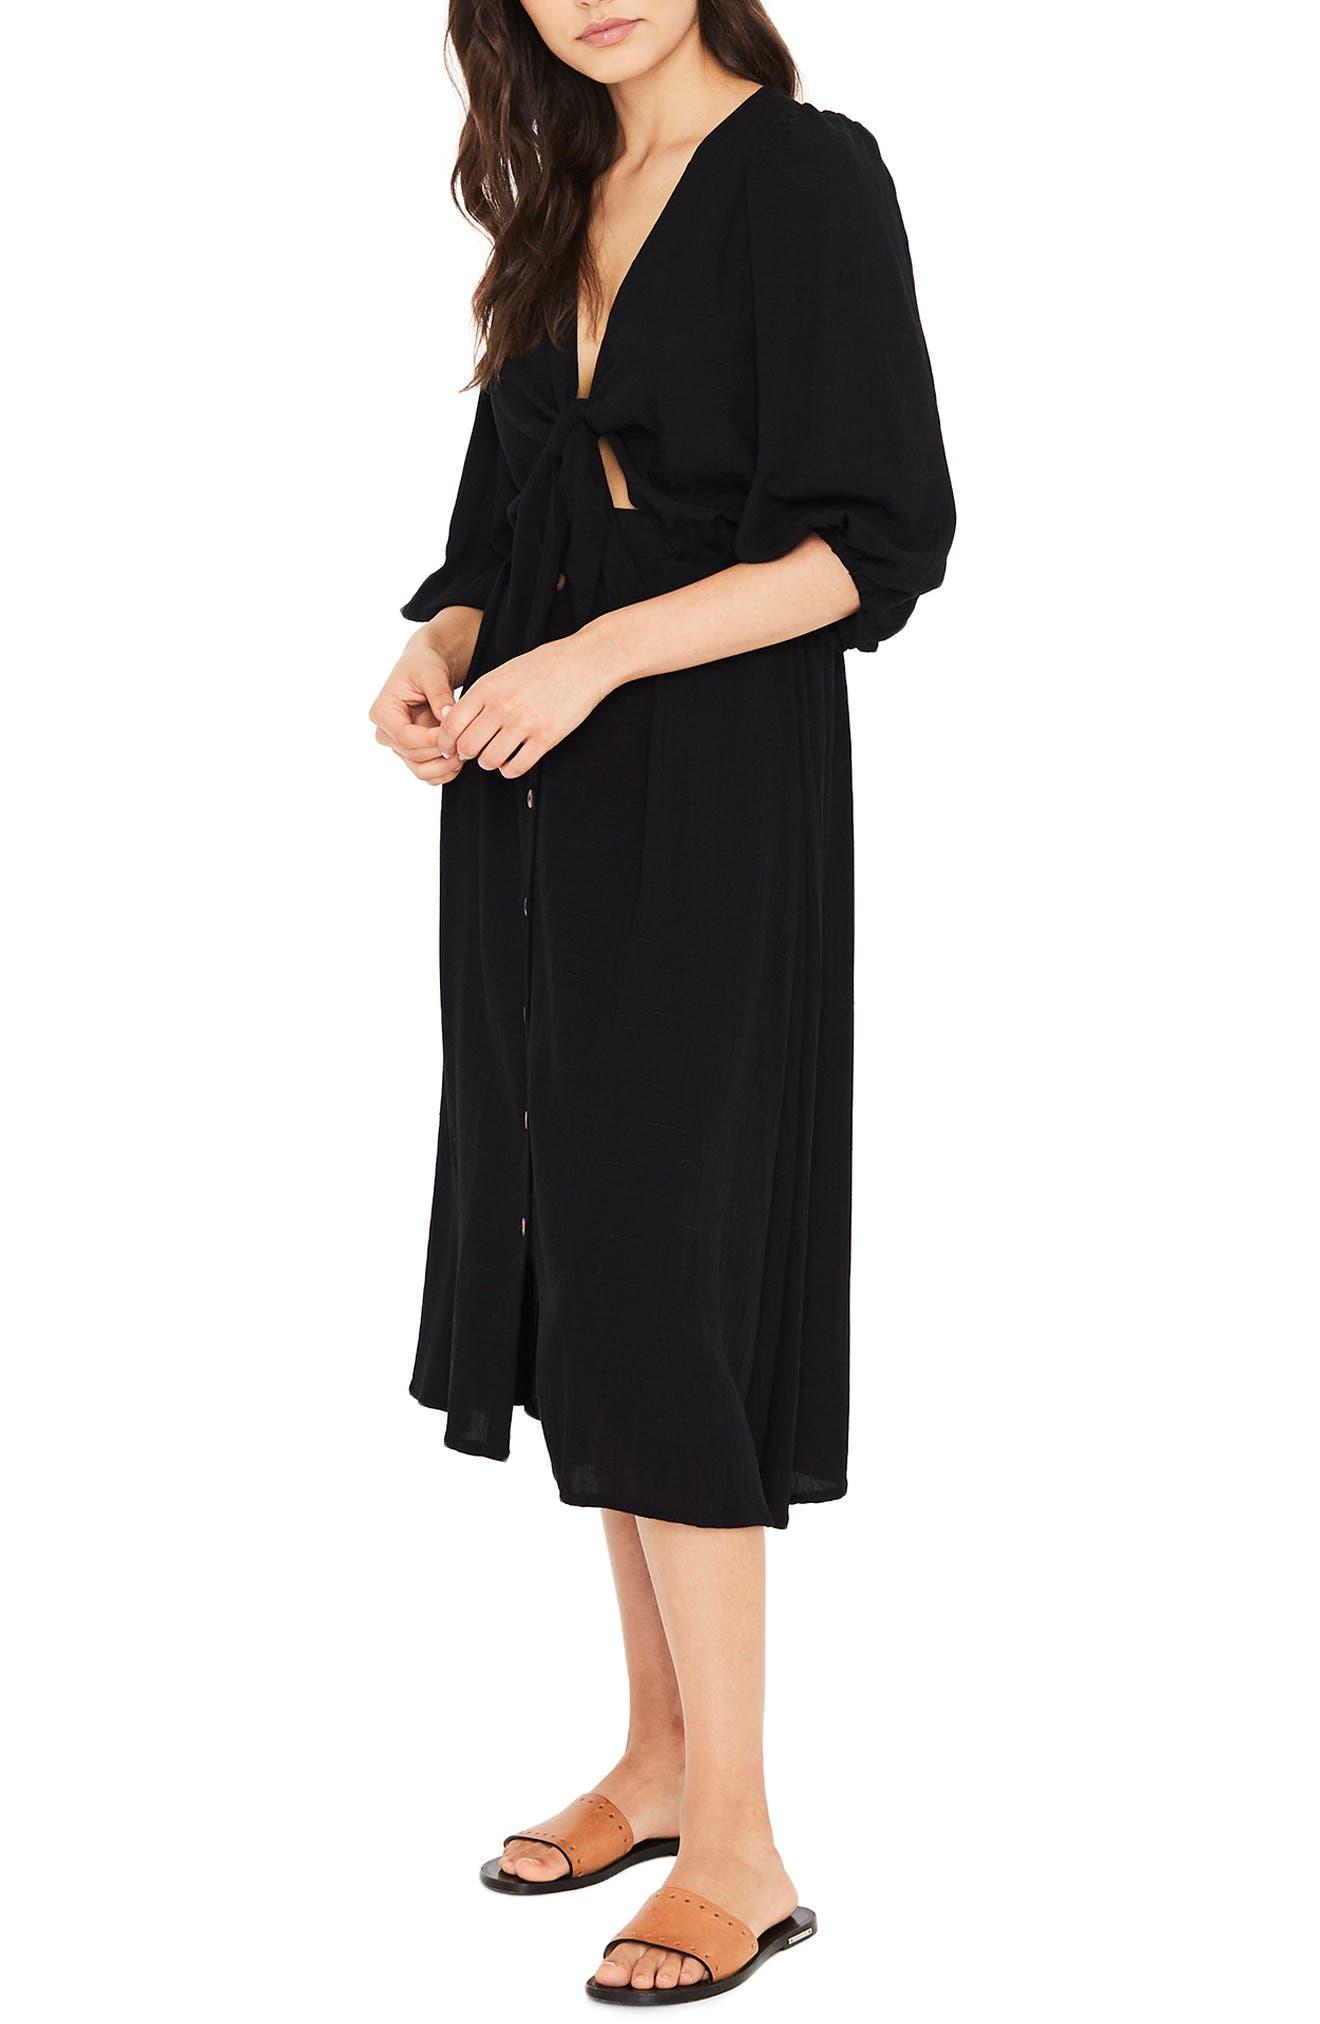 Tobago Tie Front Midi Dress,                             Alternate thumbnail 3, color,                             PLAIN BLACK